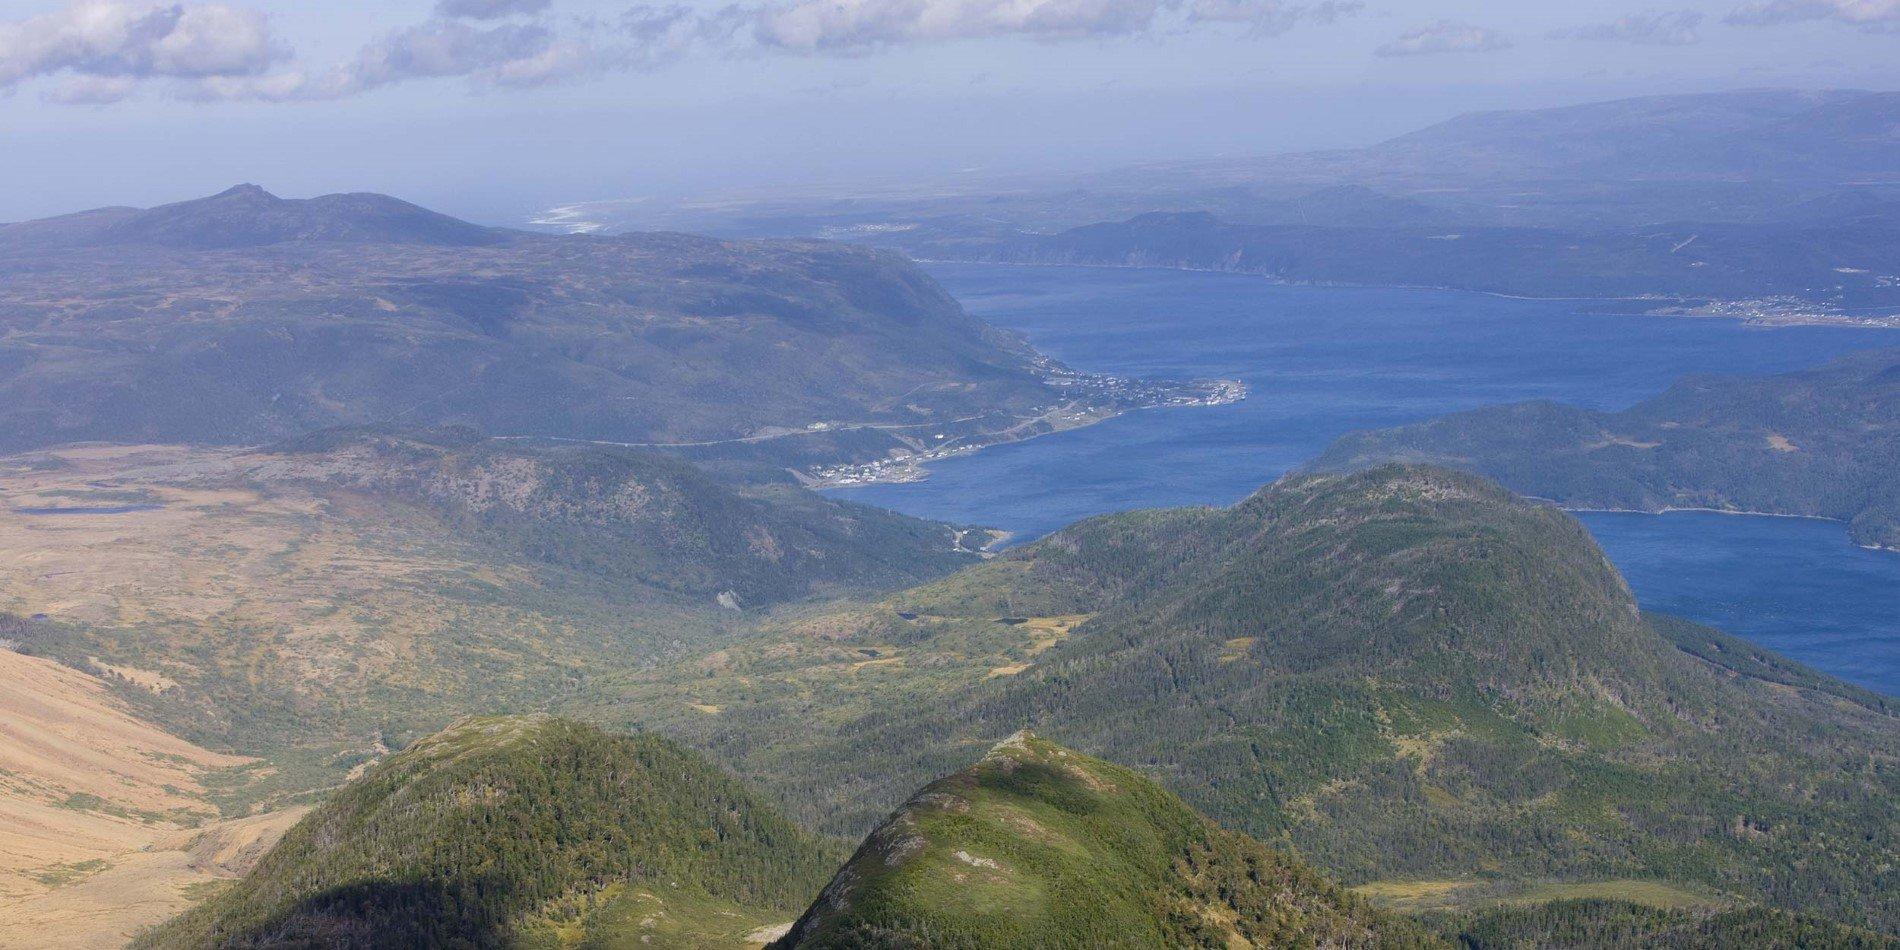 Gros Morne: Woody Point - Lookout Hills Hike | Hurtigruten UK